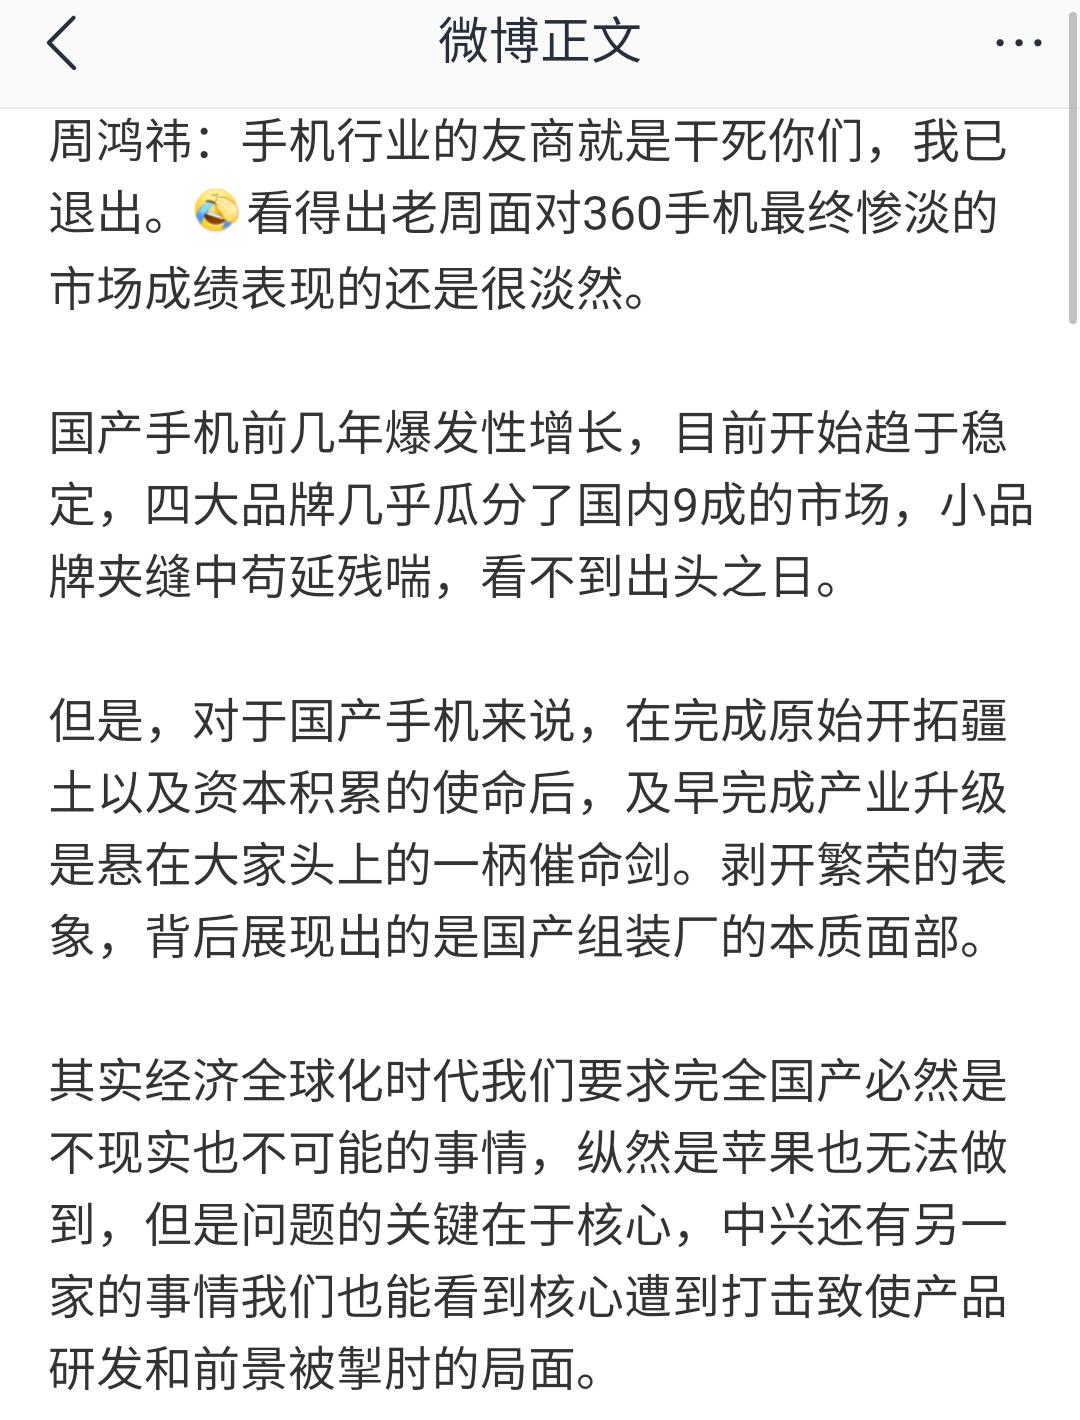 Screenshot_2019-09-11-14-25-11.png